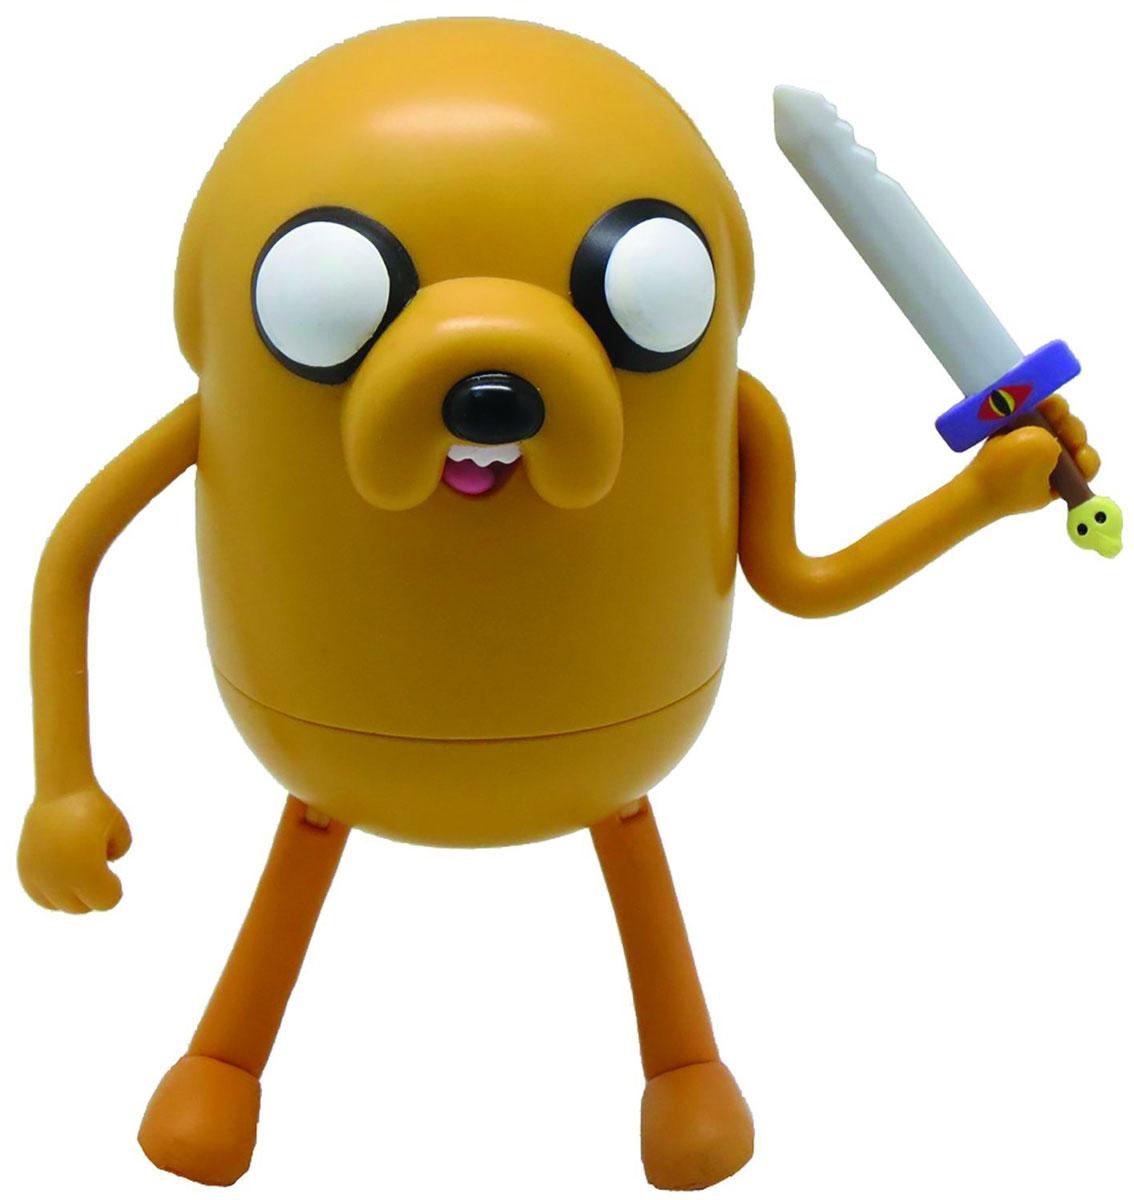 Adventure Time Фигурка Jake with Sword фигурка scalers adventure time finn 5 см